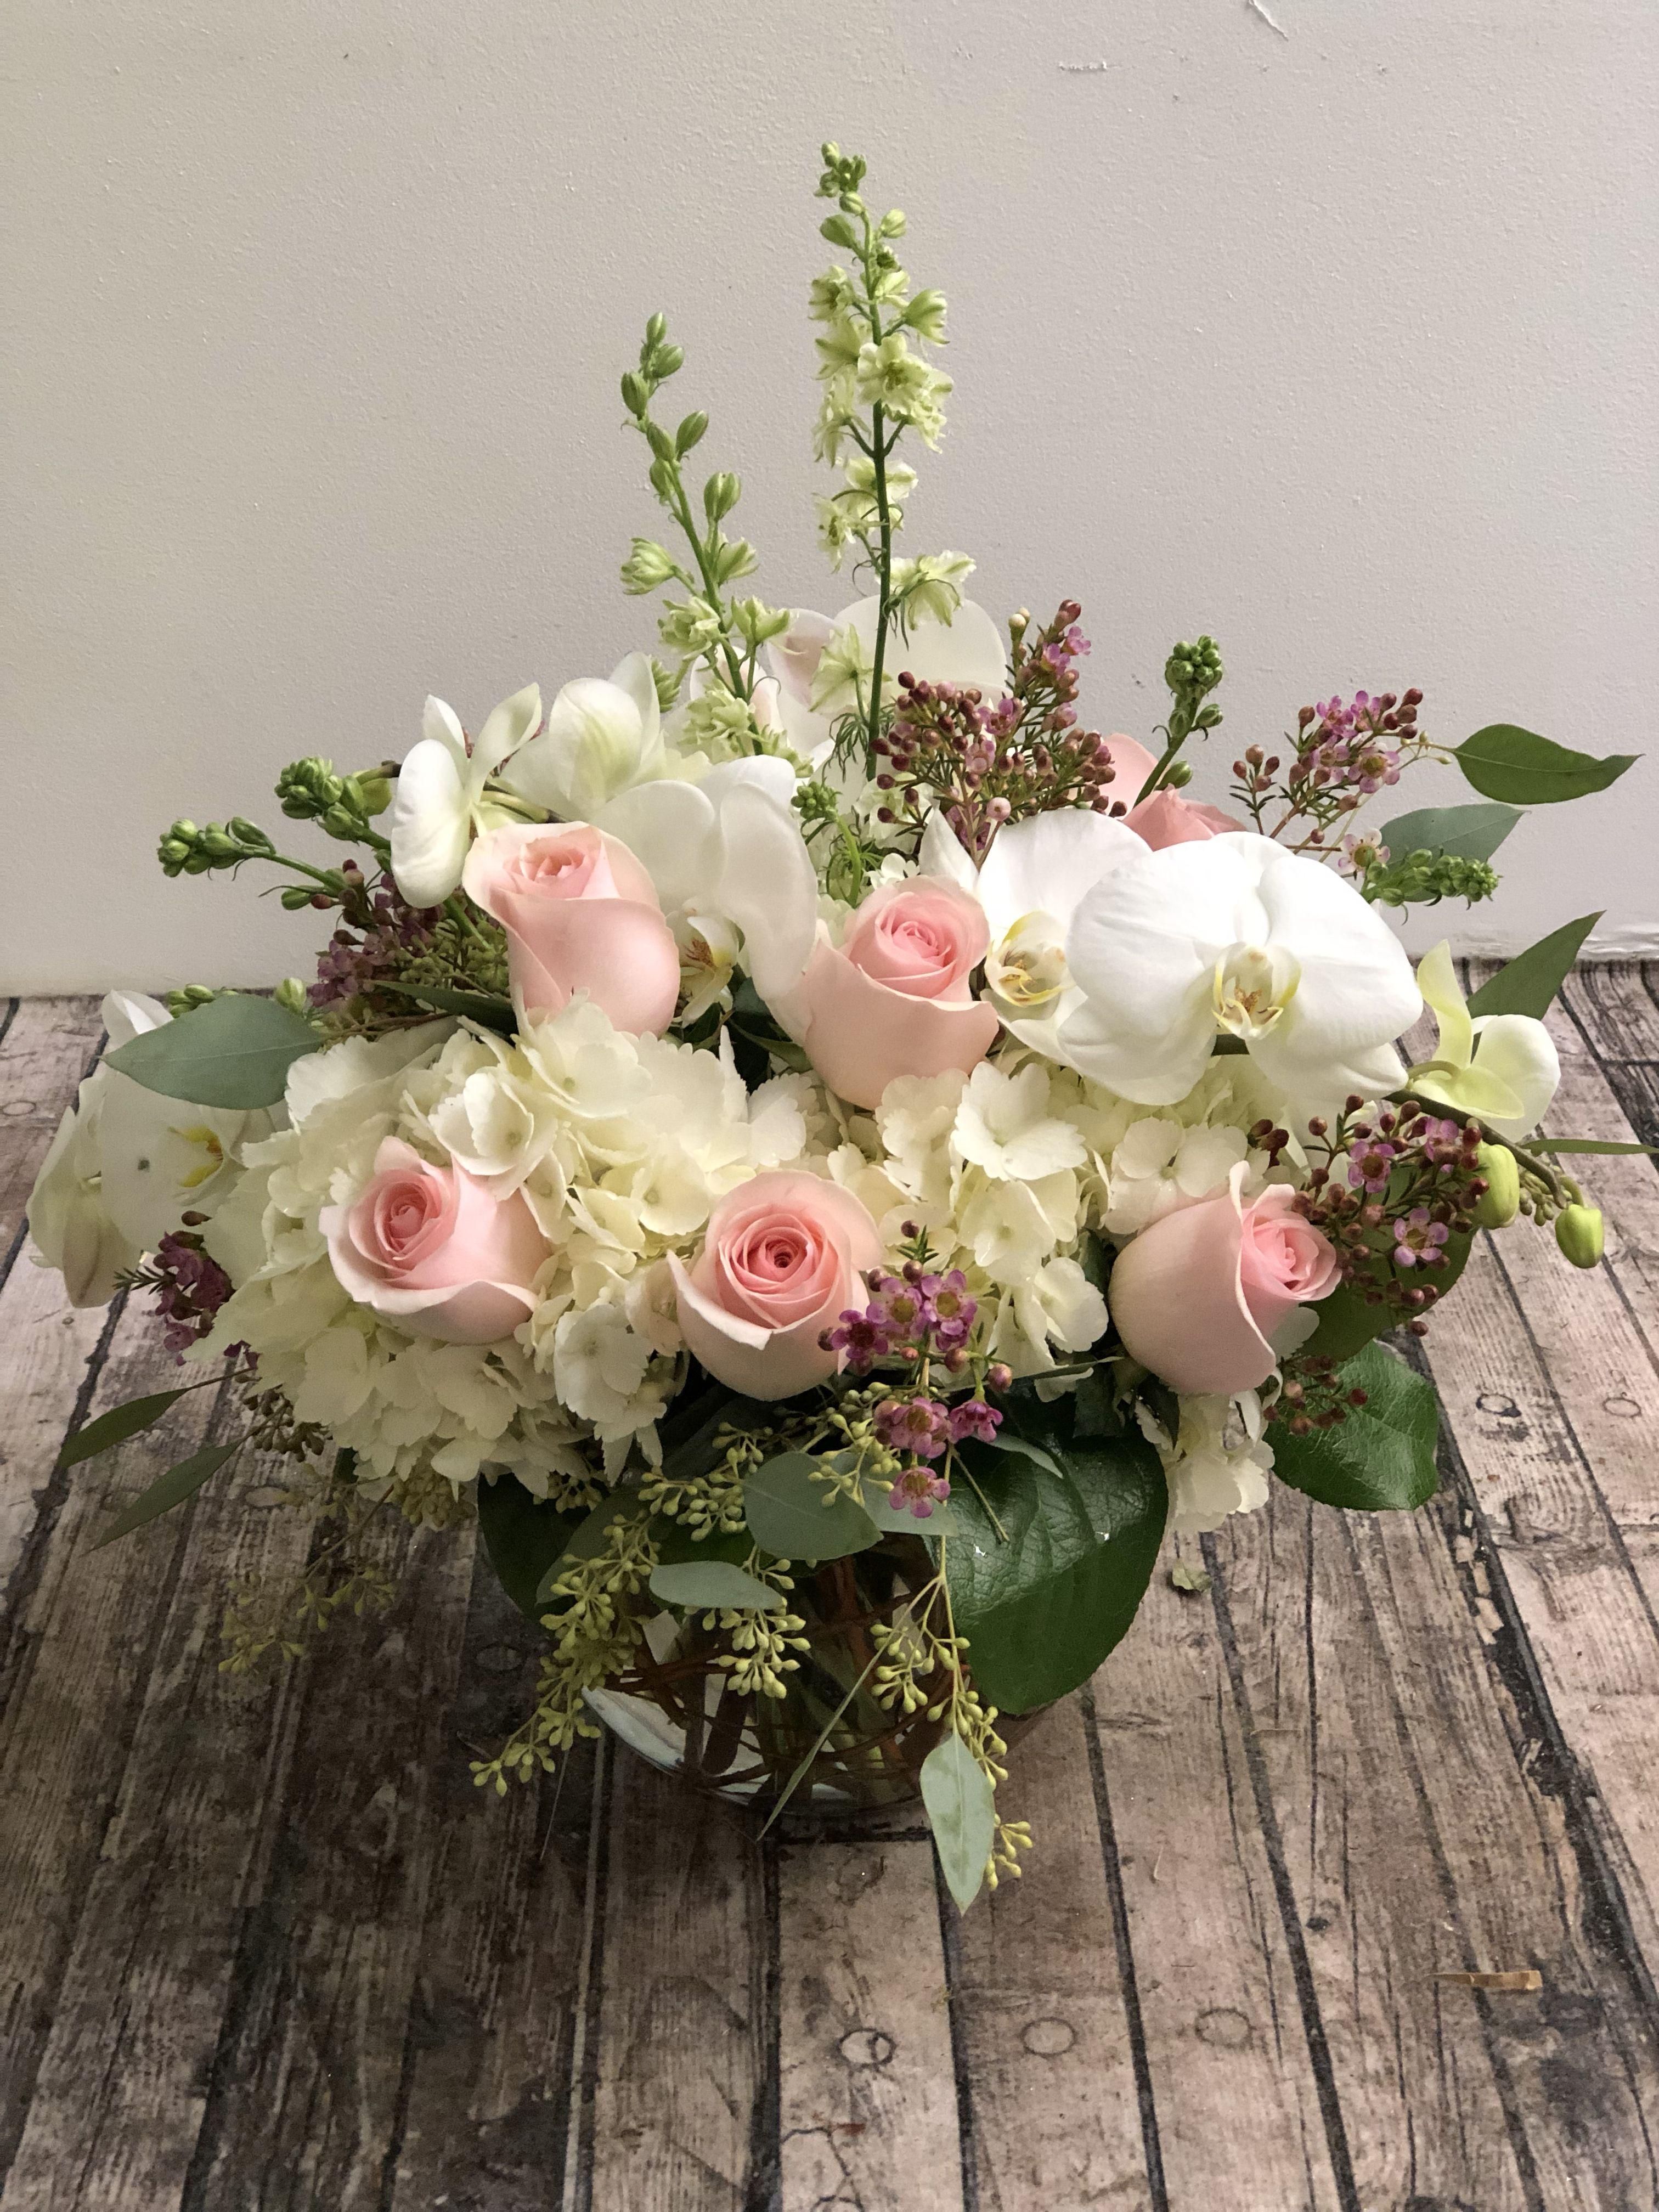 Orchid And Rose Arrangement Rose Arrangements Flower Arrangements Flower Delivery